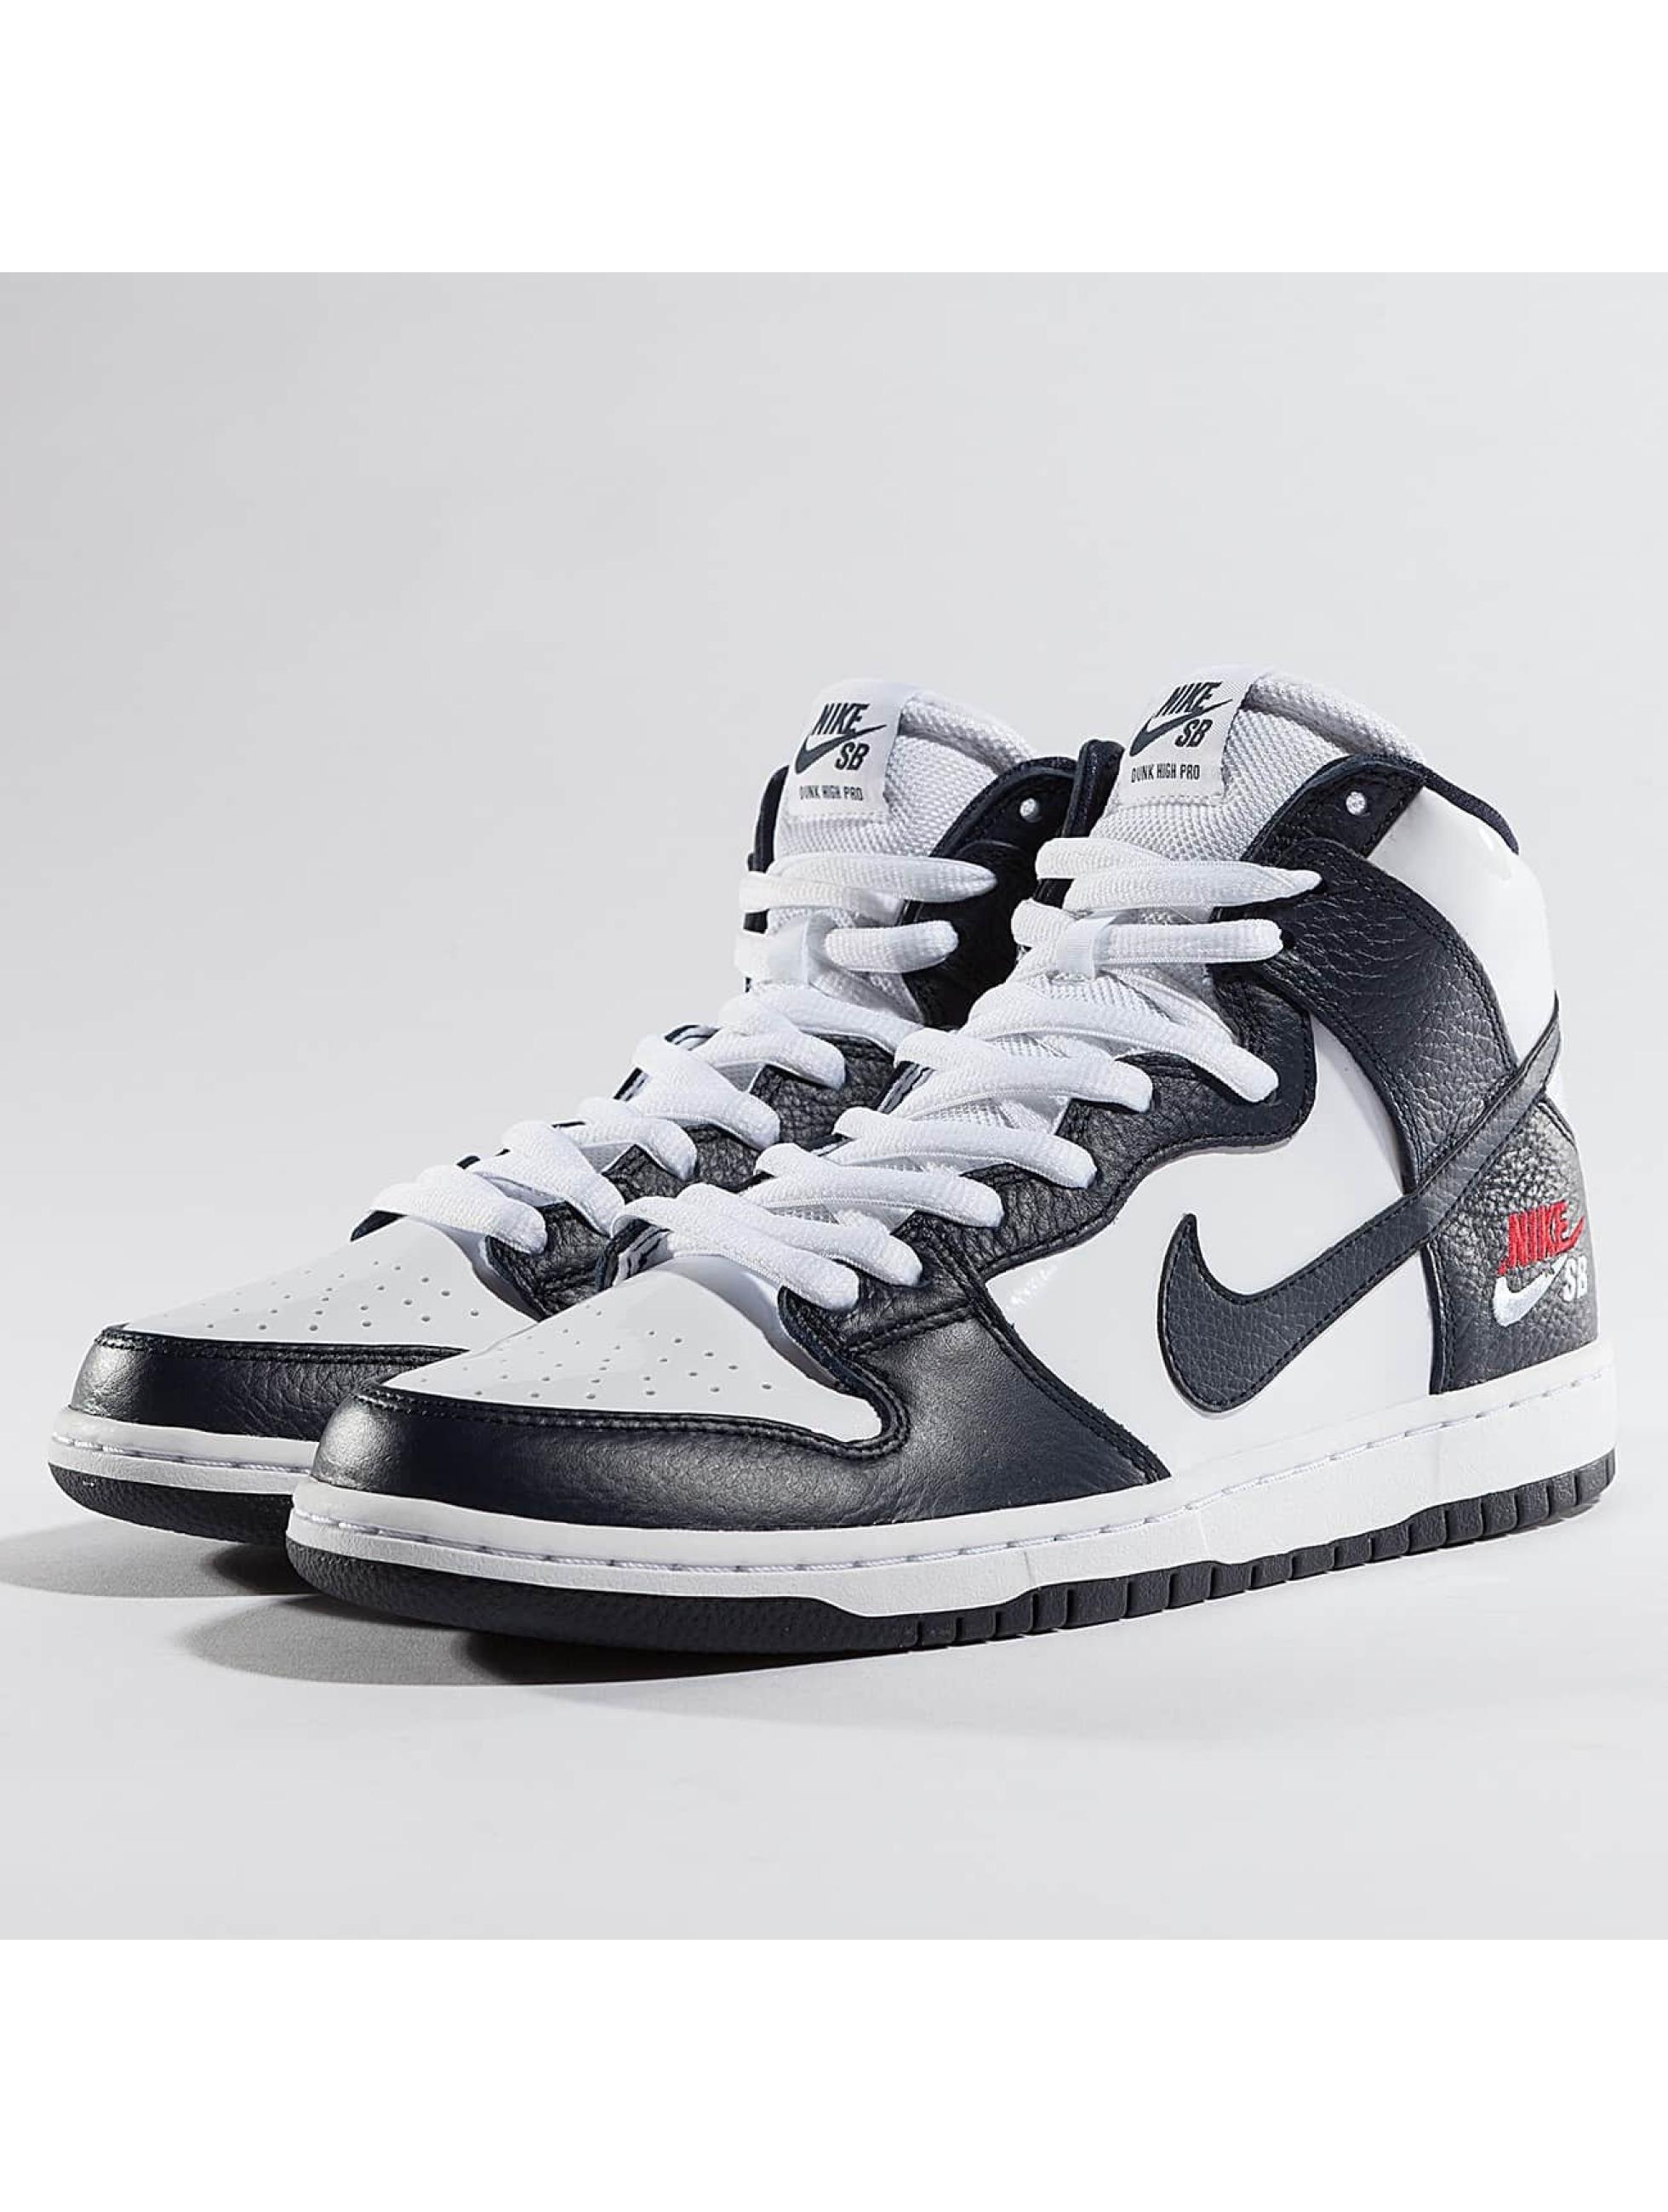 nike sb herren sneaker sb dunk high pro in blau 364663. Black Bedroom Furniture Sets. Home Design Ideas